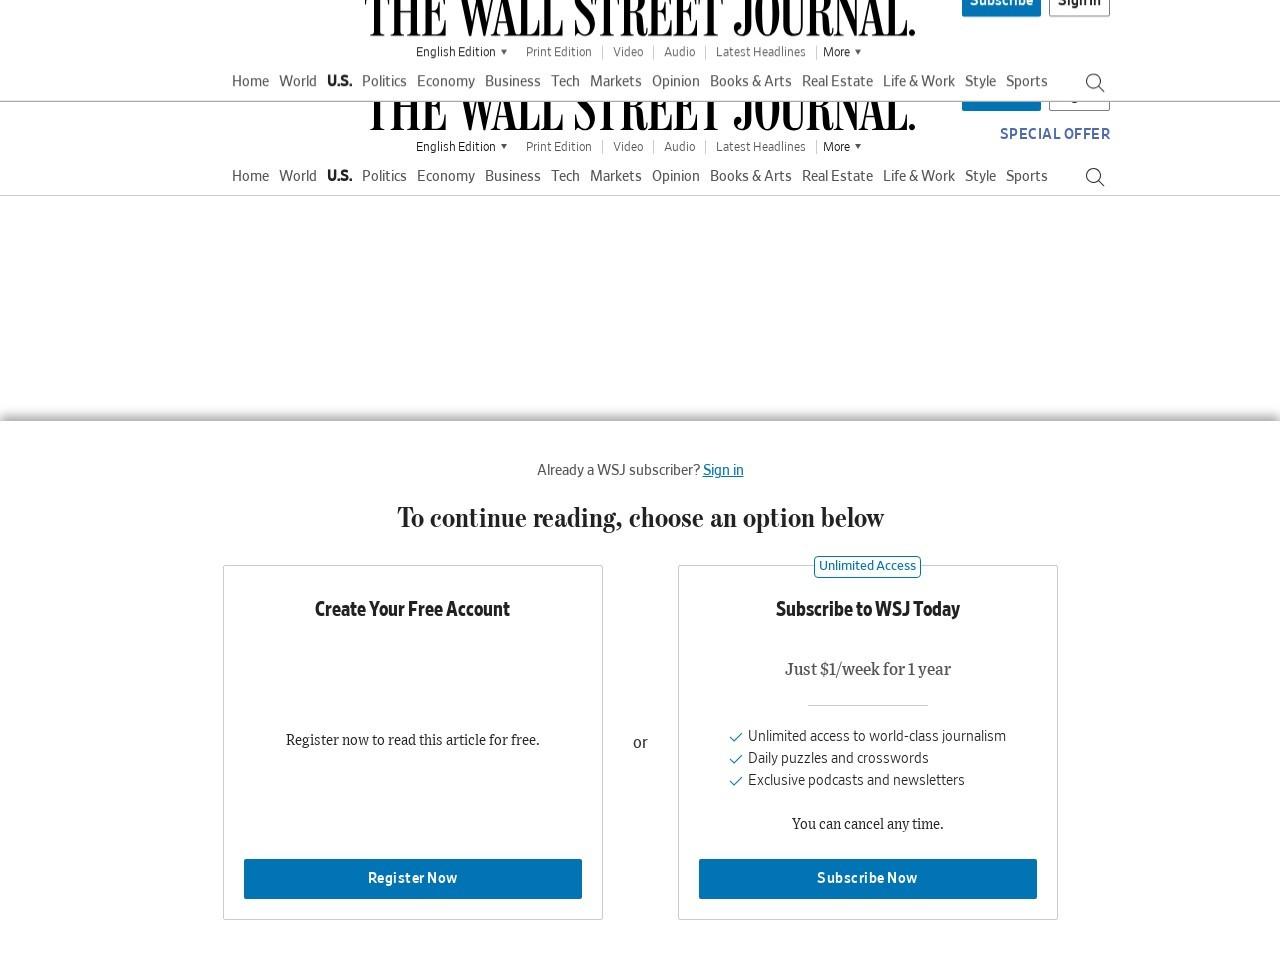 Children Help Propel Gay-Marriage Ruling